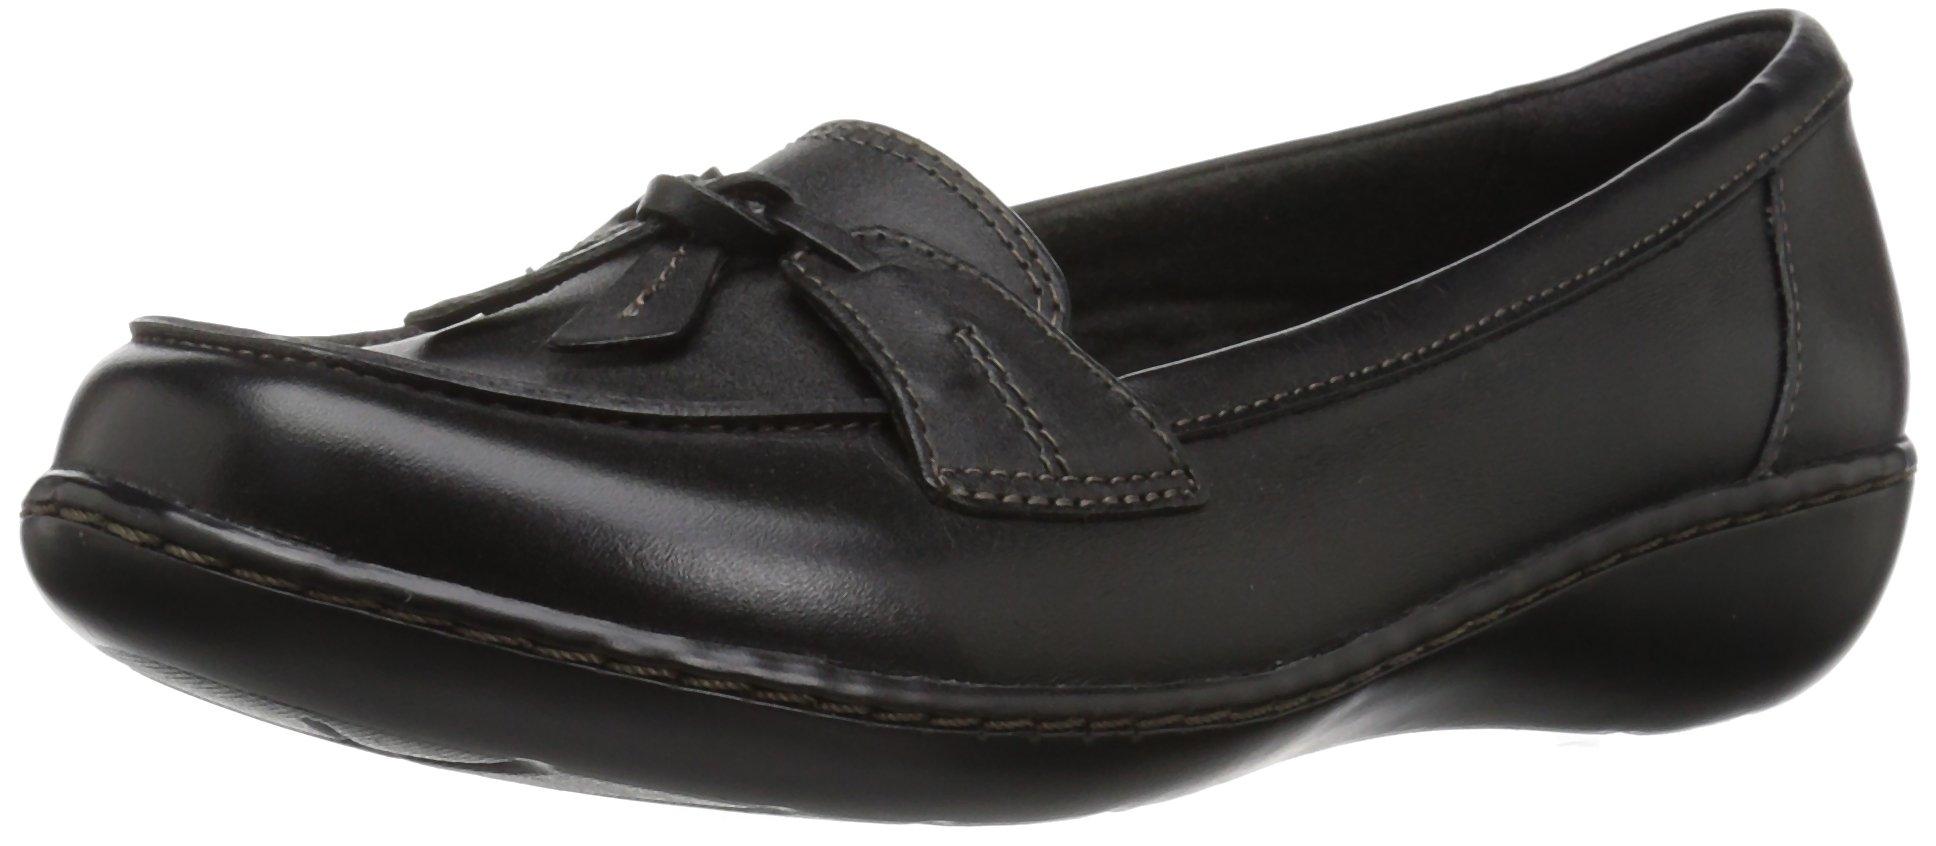 CLARKS Women's Ashland Bubble Slip-on Loafer, Black Leather, 11 W US